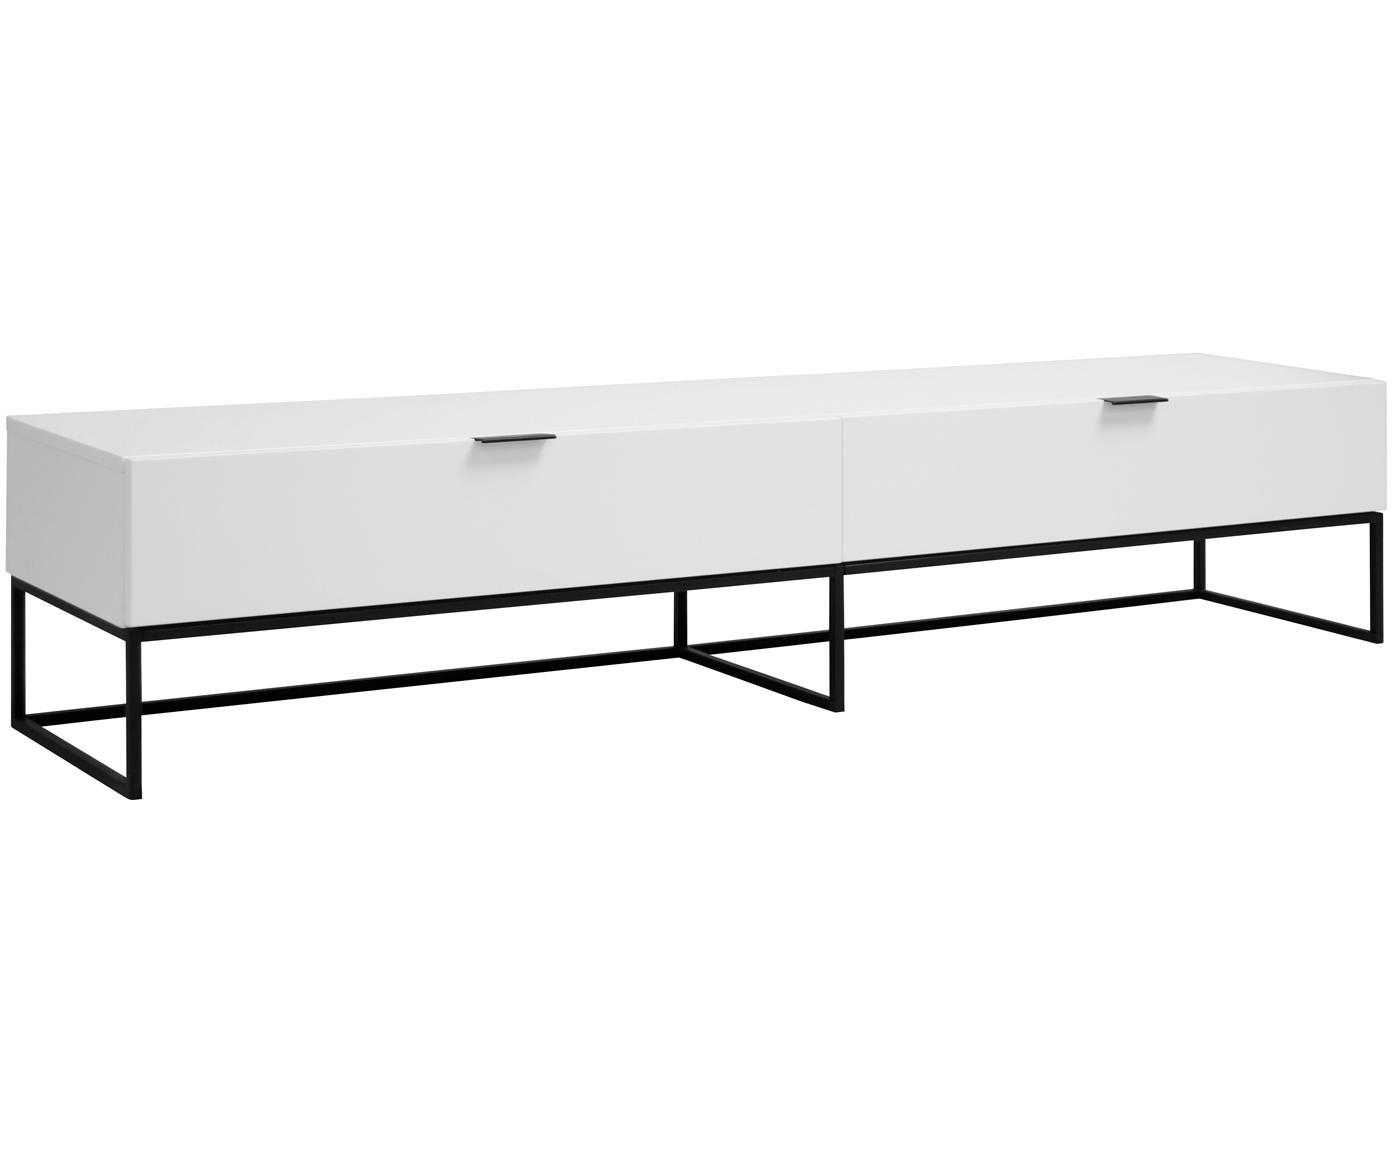 Mueble TV Kobe, Blanco, negro, An 200 x Al 40 cm